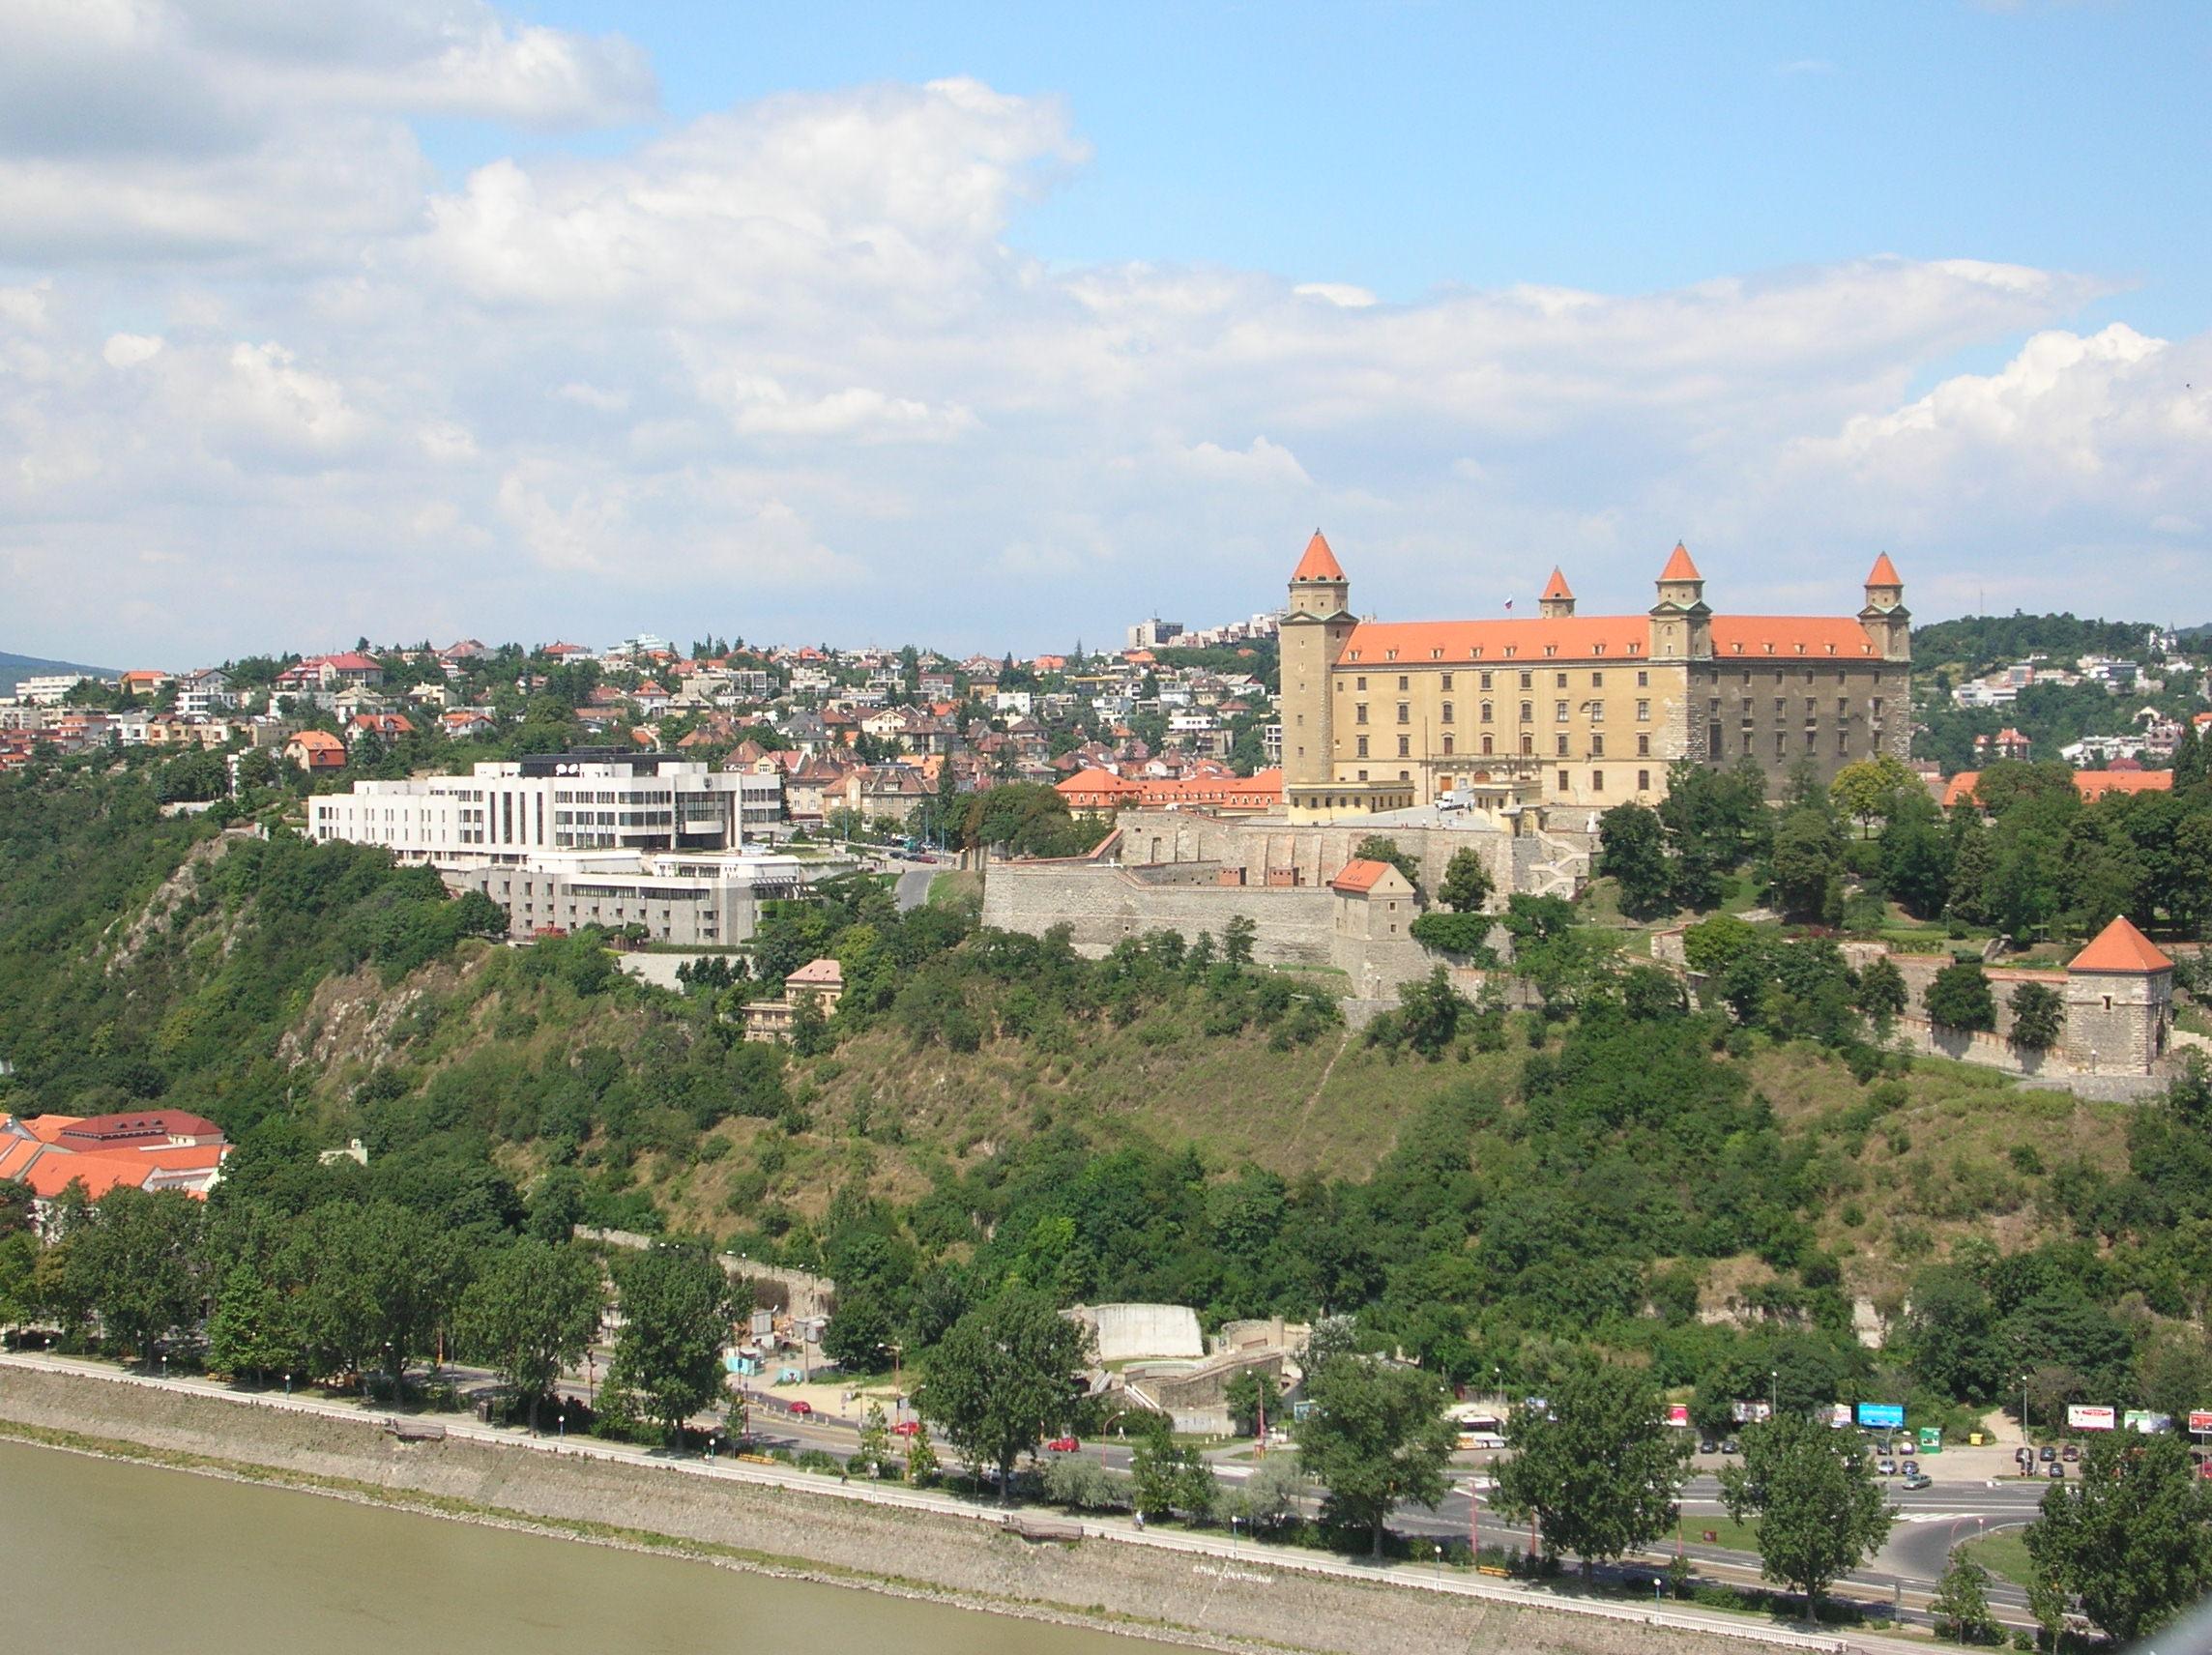 Castle of Bratislava and the Slovakian Parliament, Bratislava, Slovakia